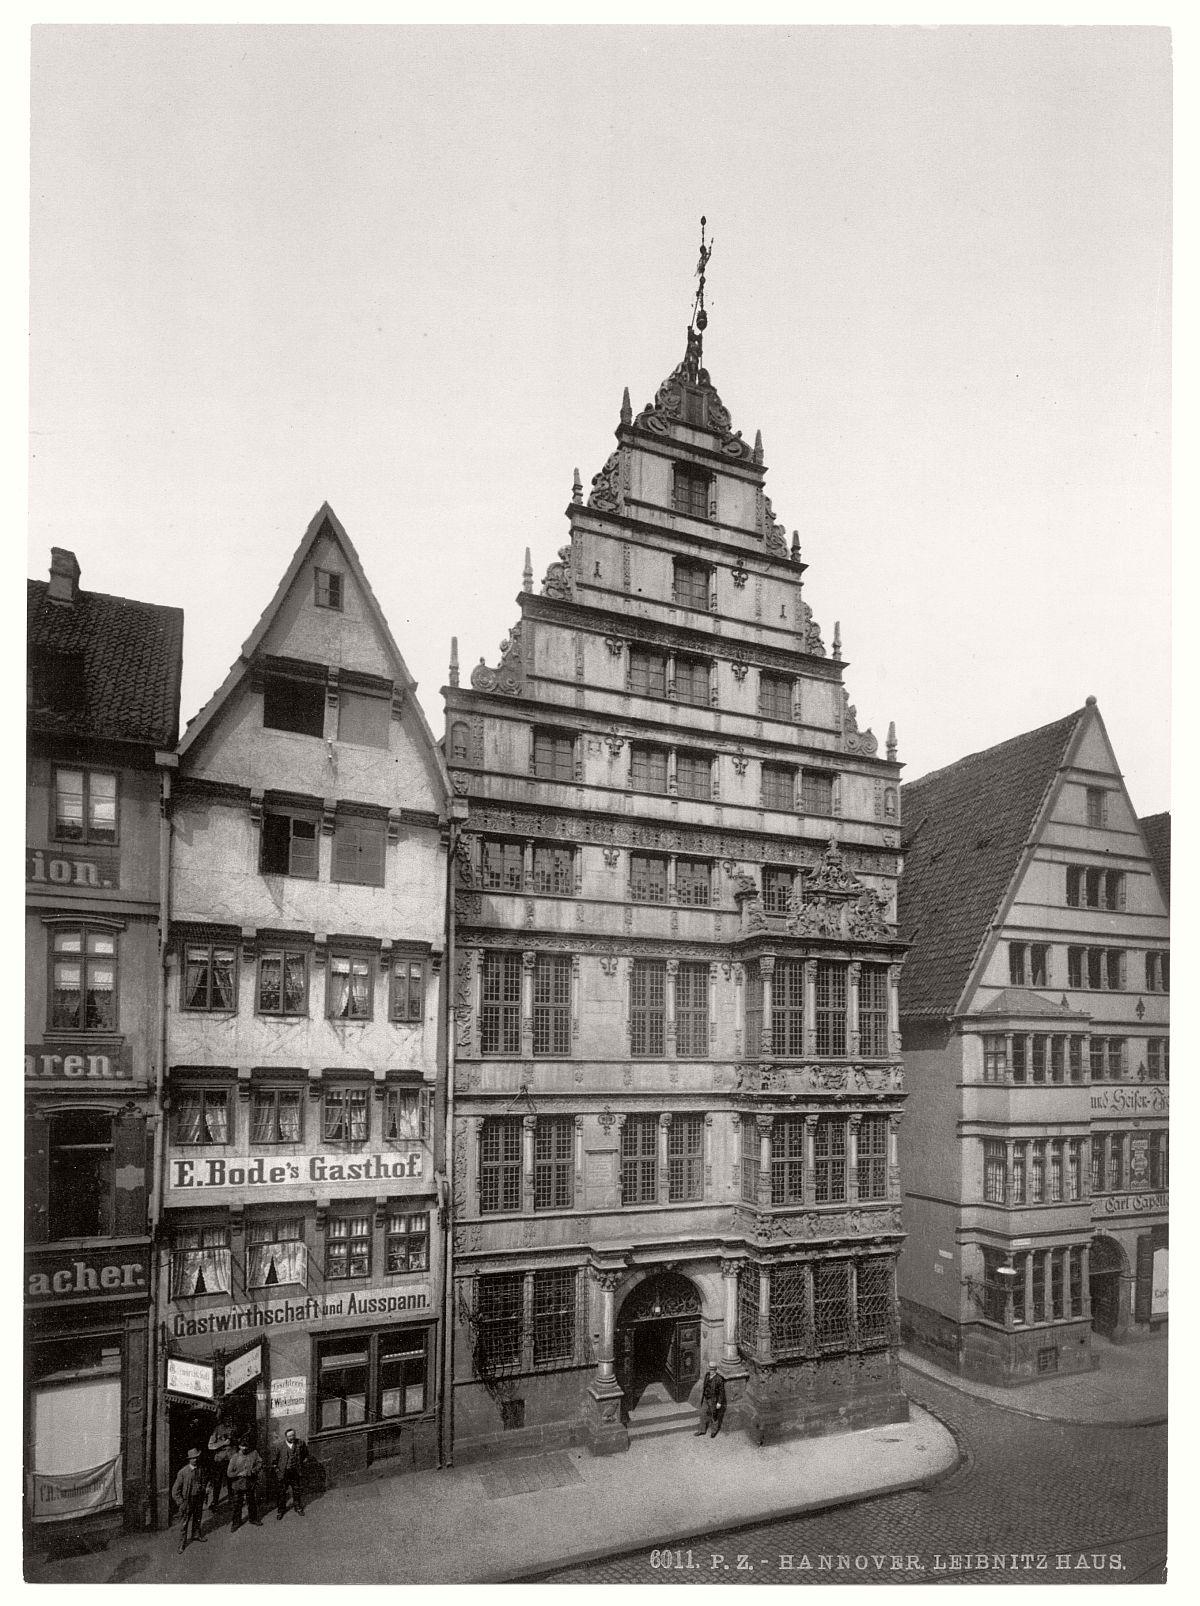 vintage-historic-photos-of-hanover-germany-circa-1890s-19th-century-07